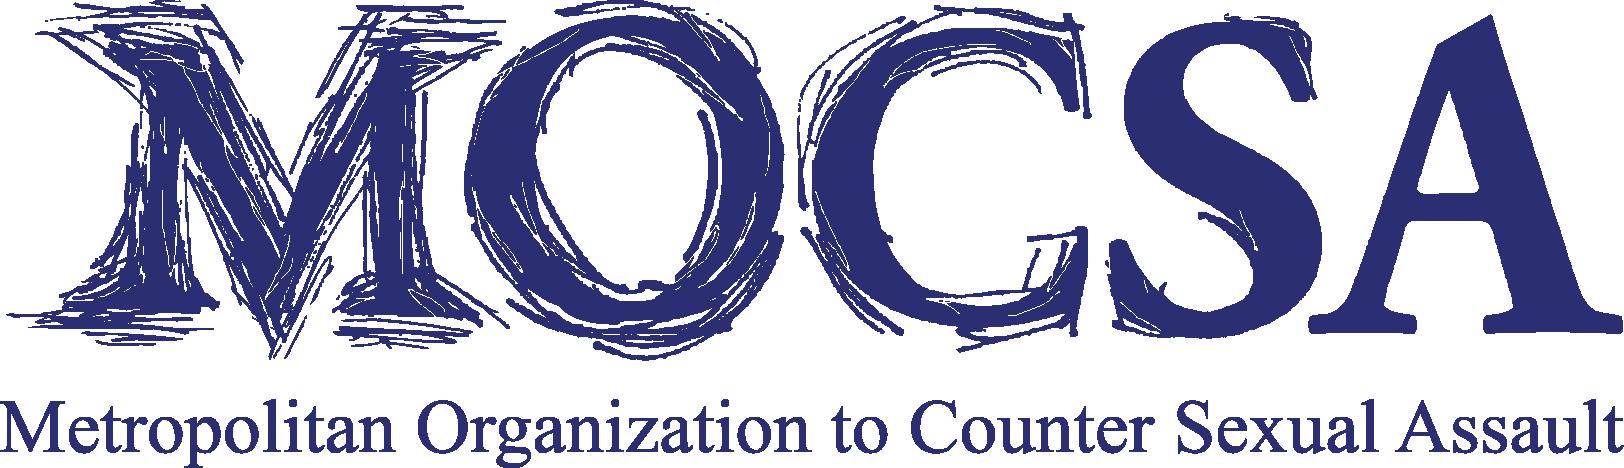 Metropolitan Organization to Counter Sexual Assault